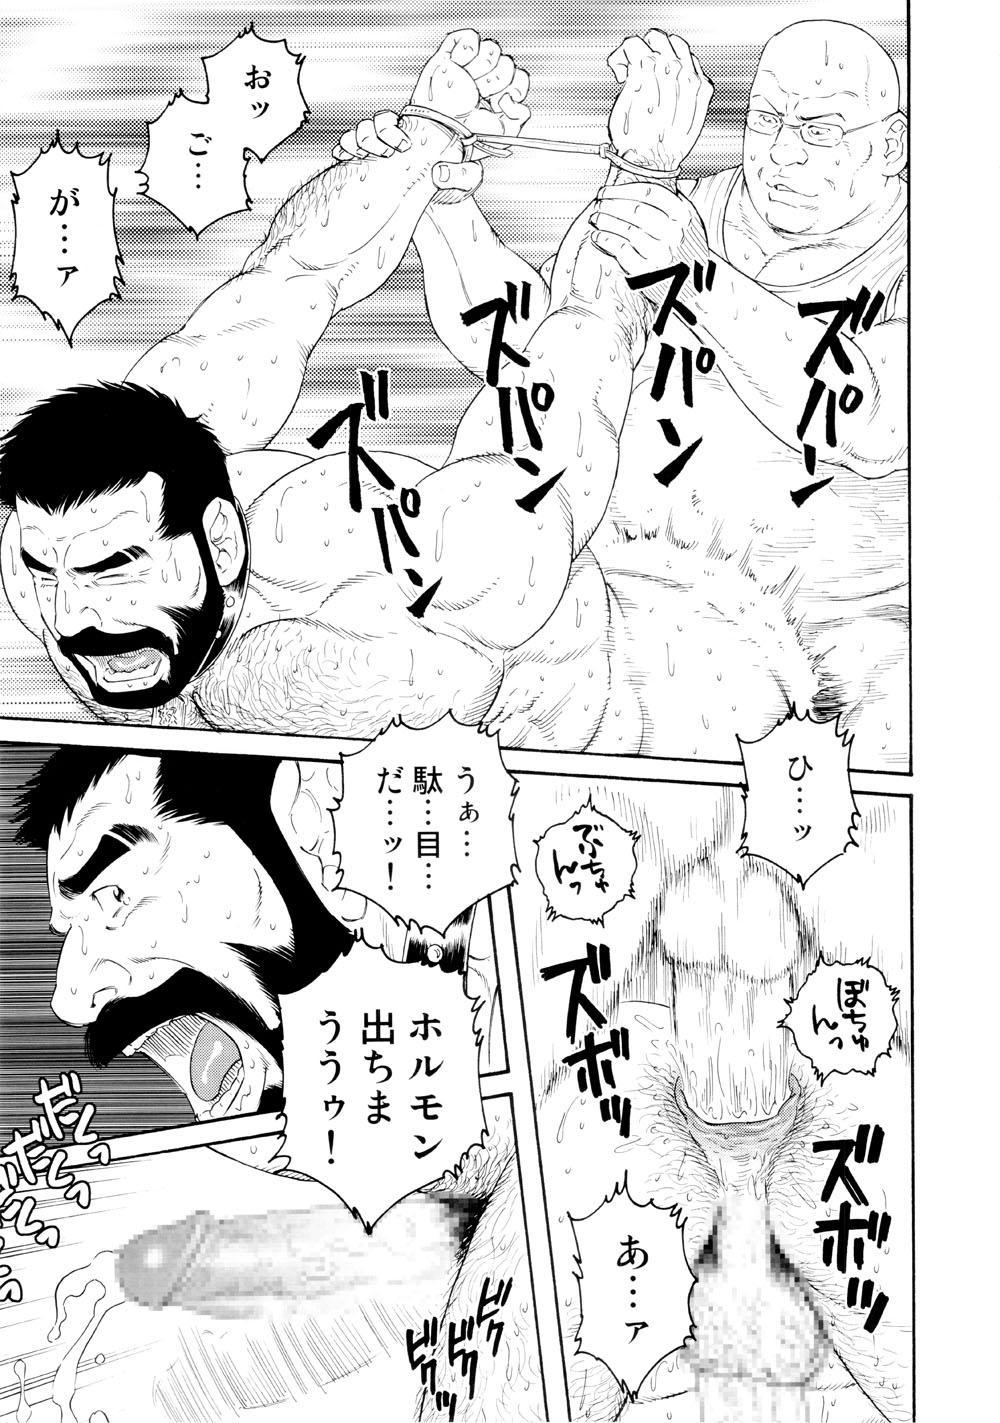 Genryu Chapter 3 8